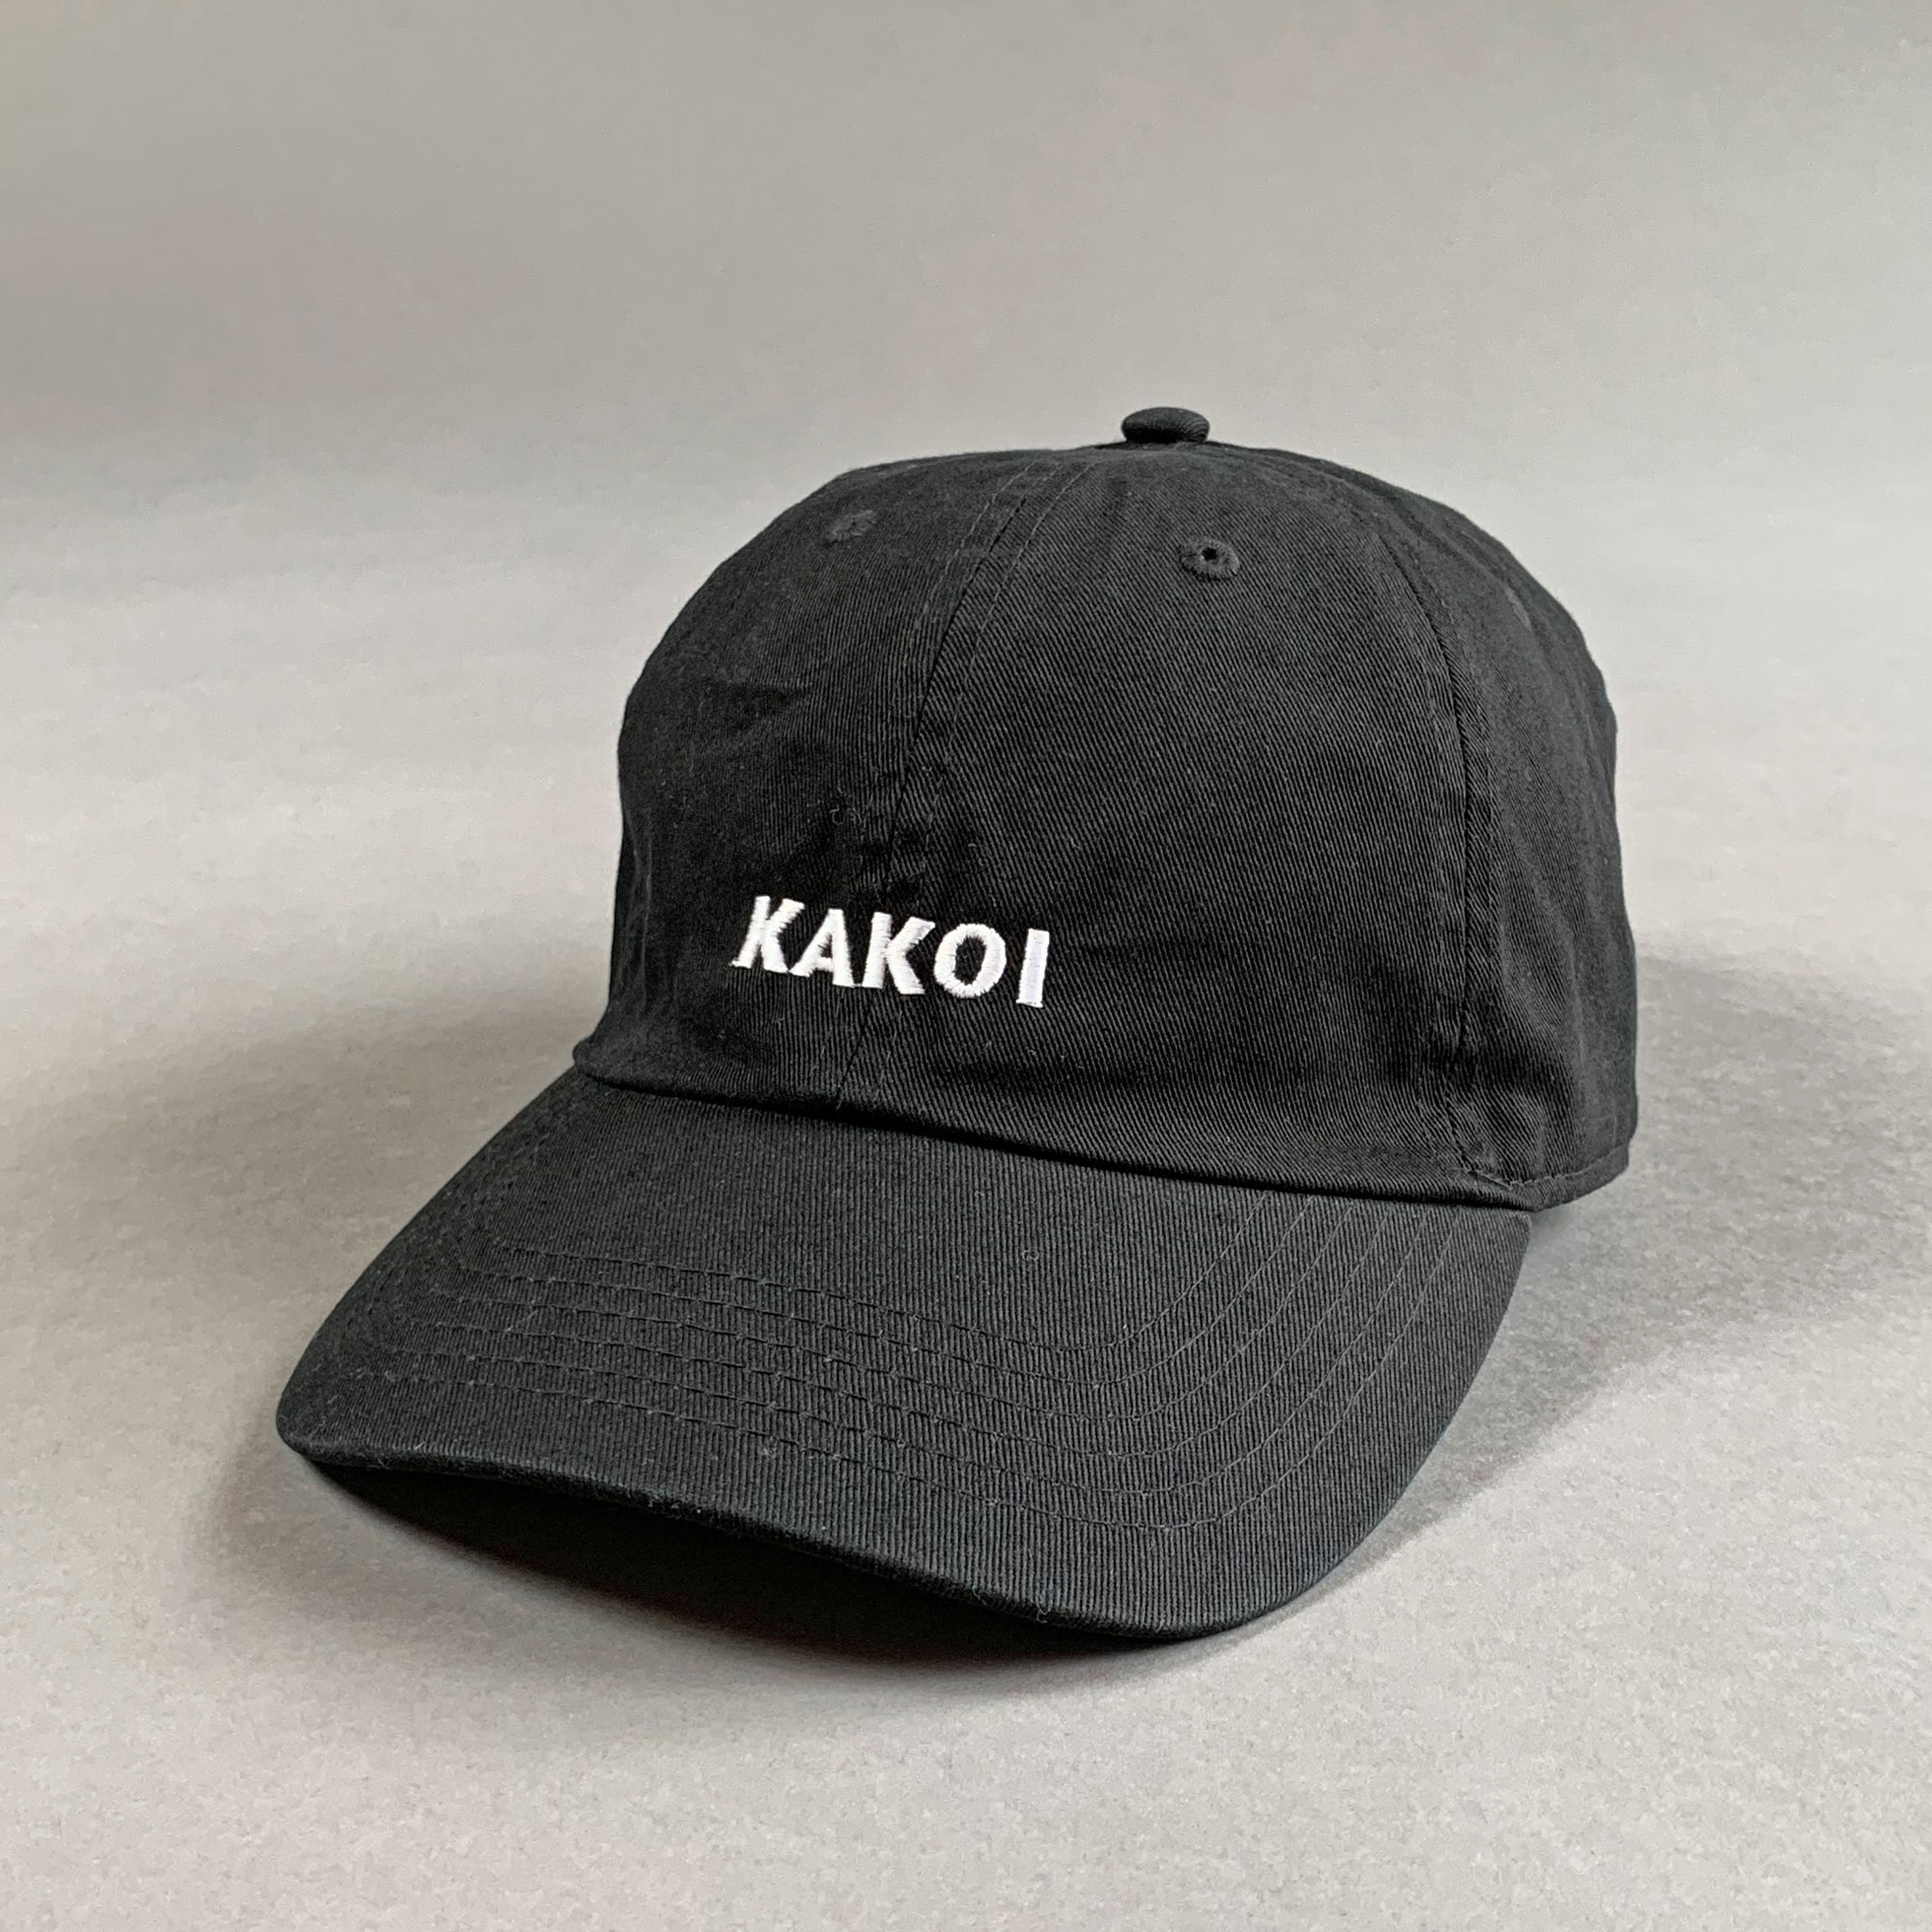 KKCP-001-BLK